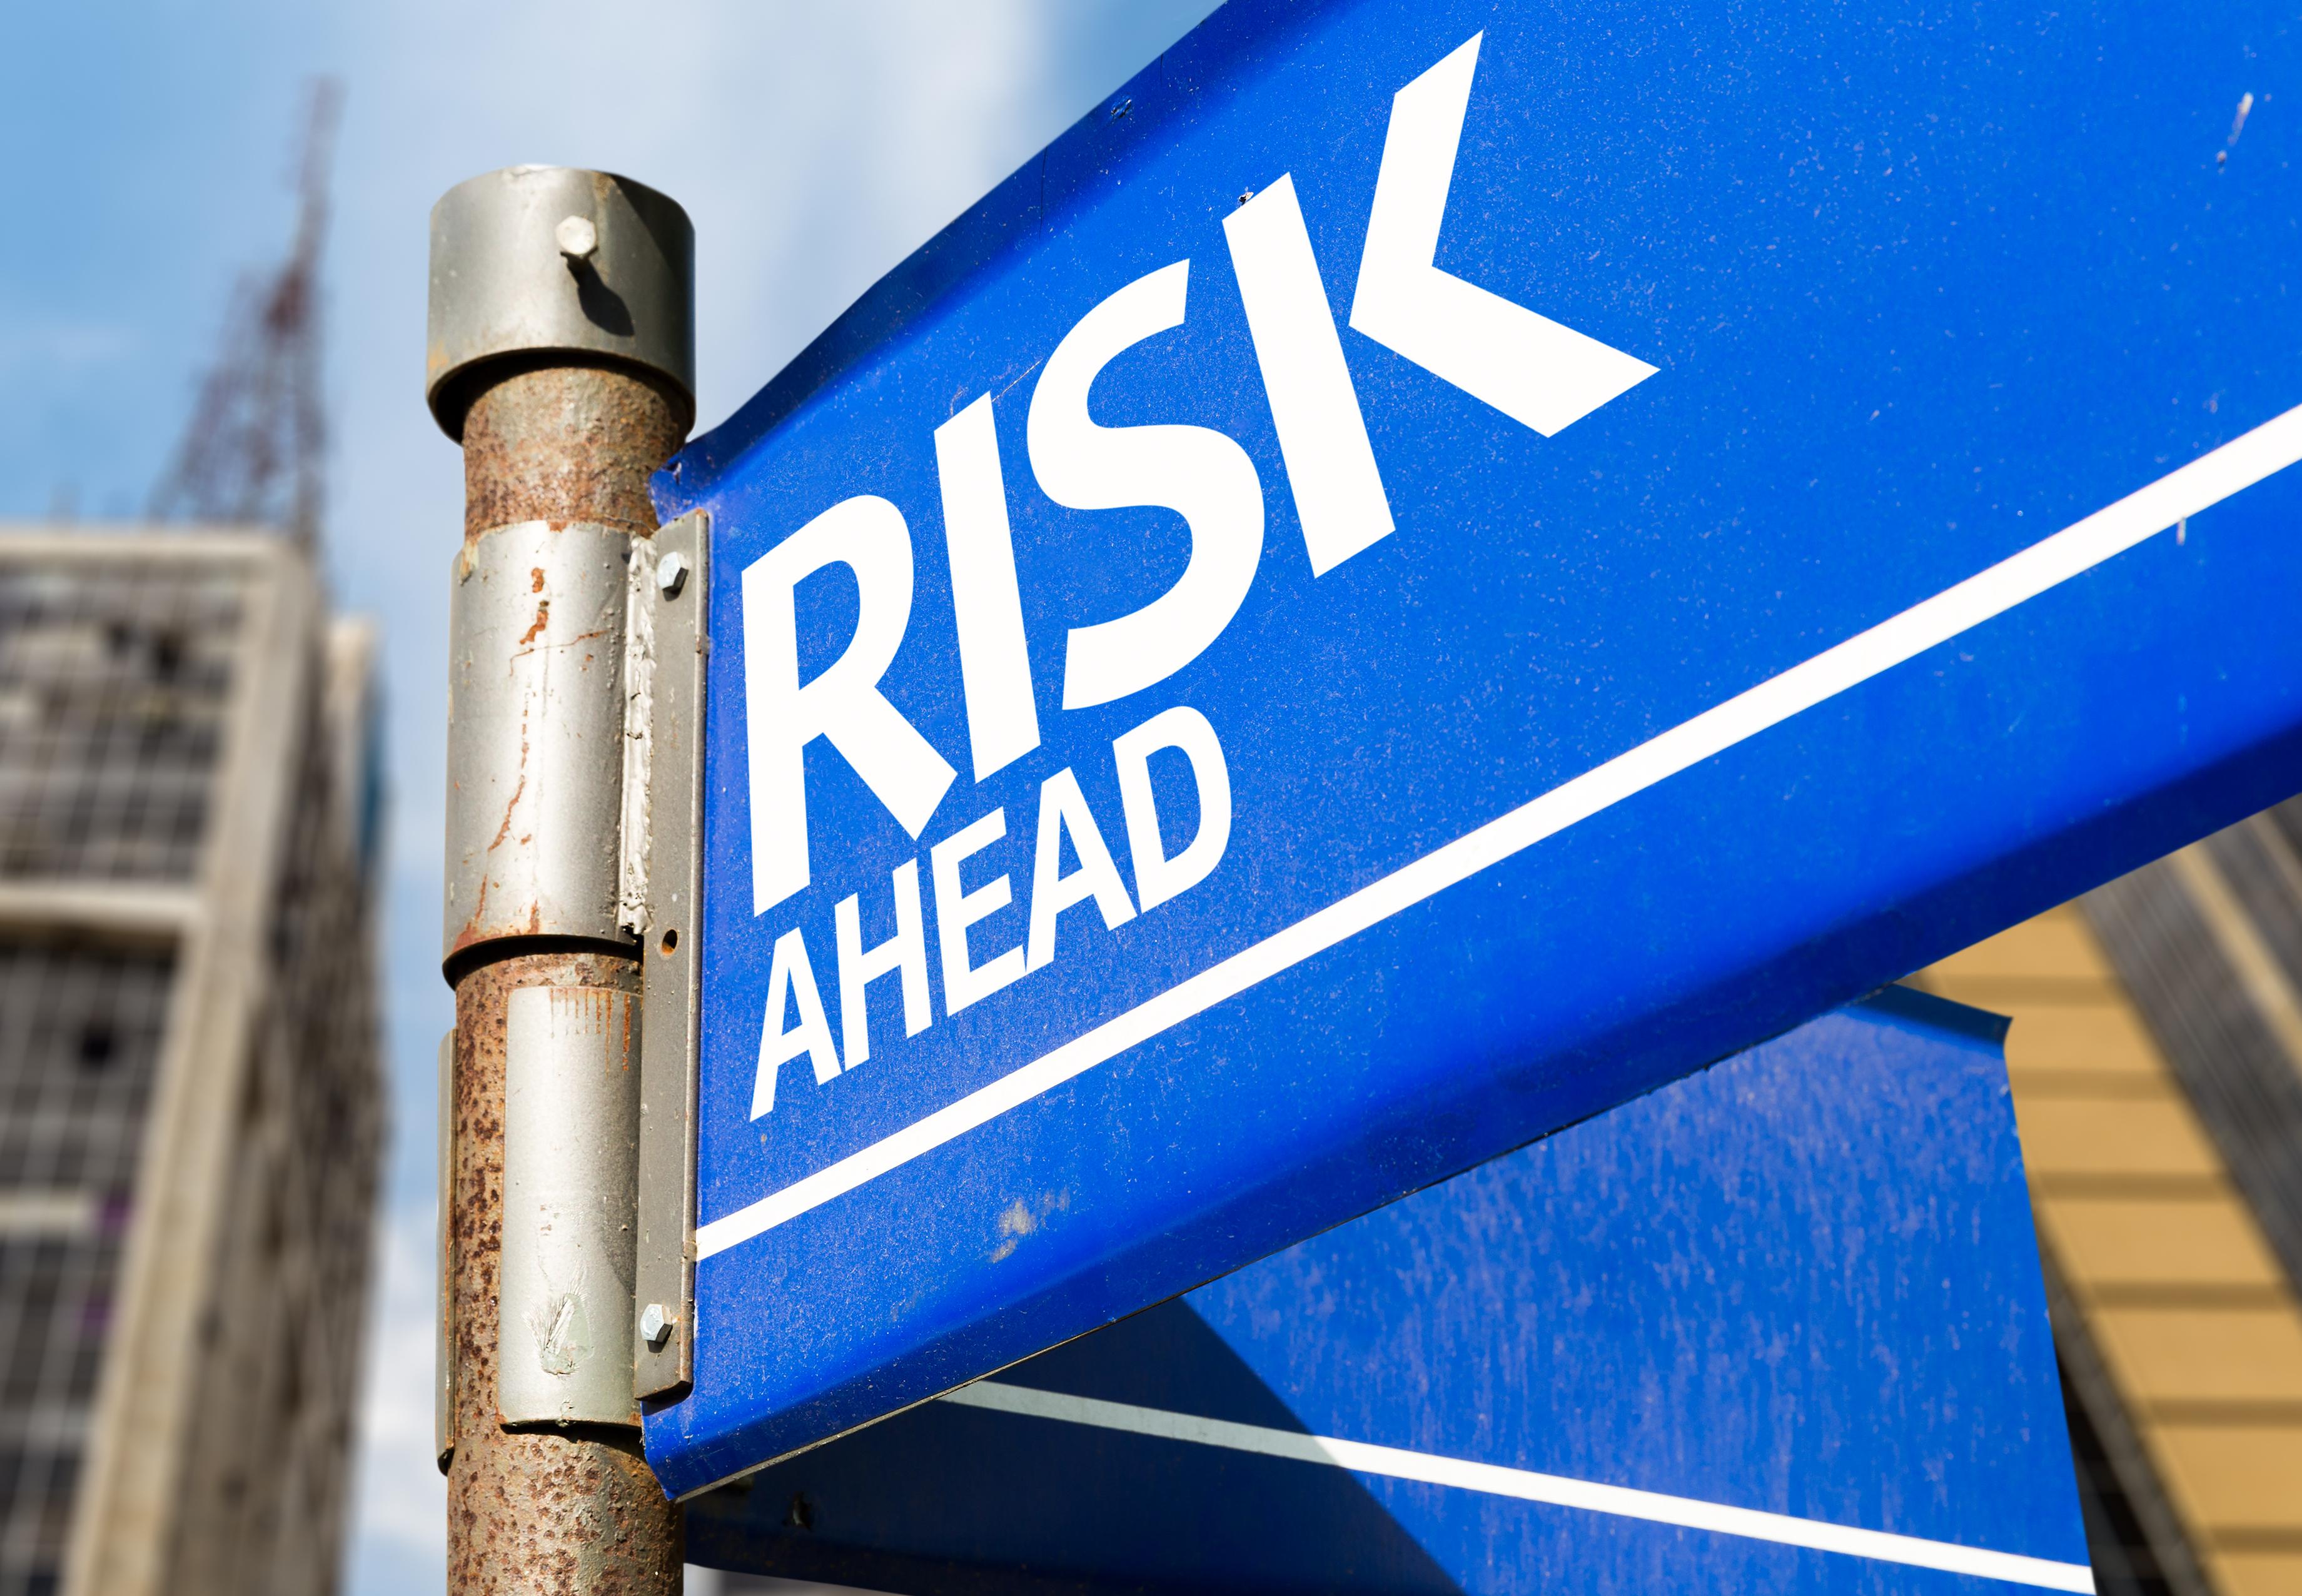 A street sign that implies risk ahead.